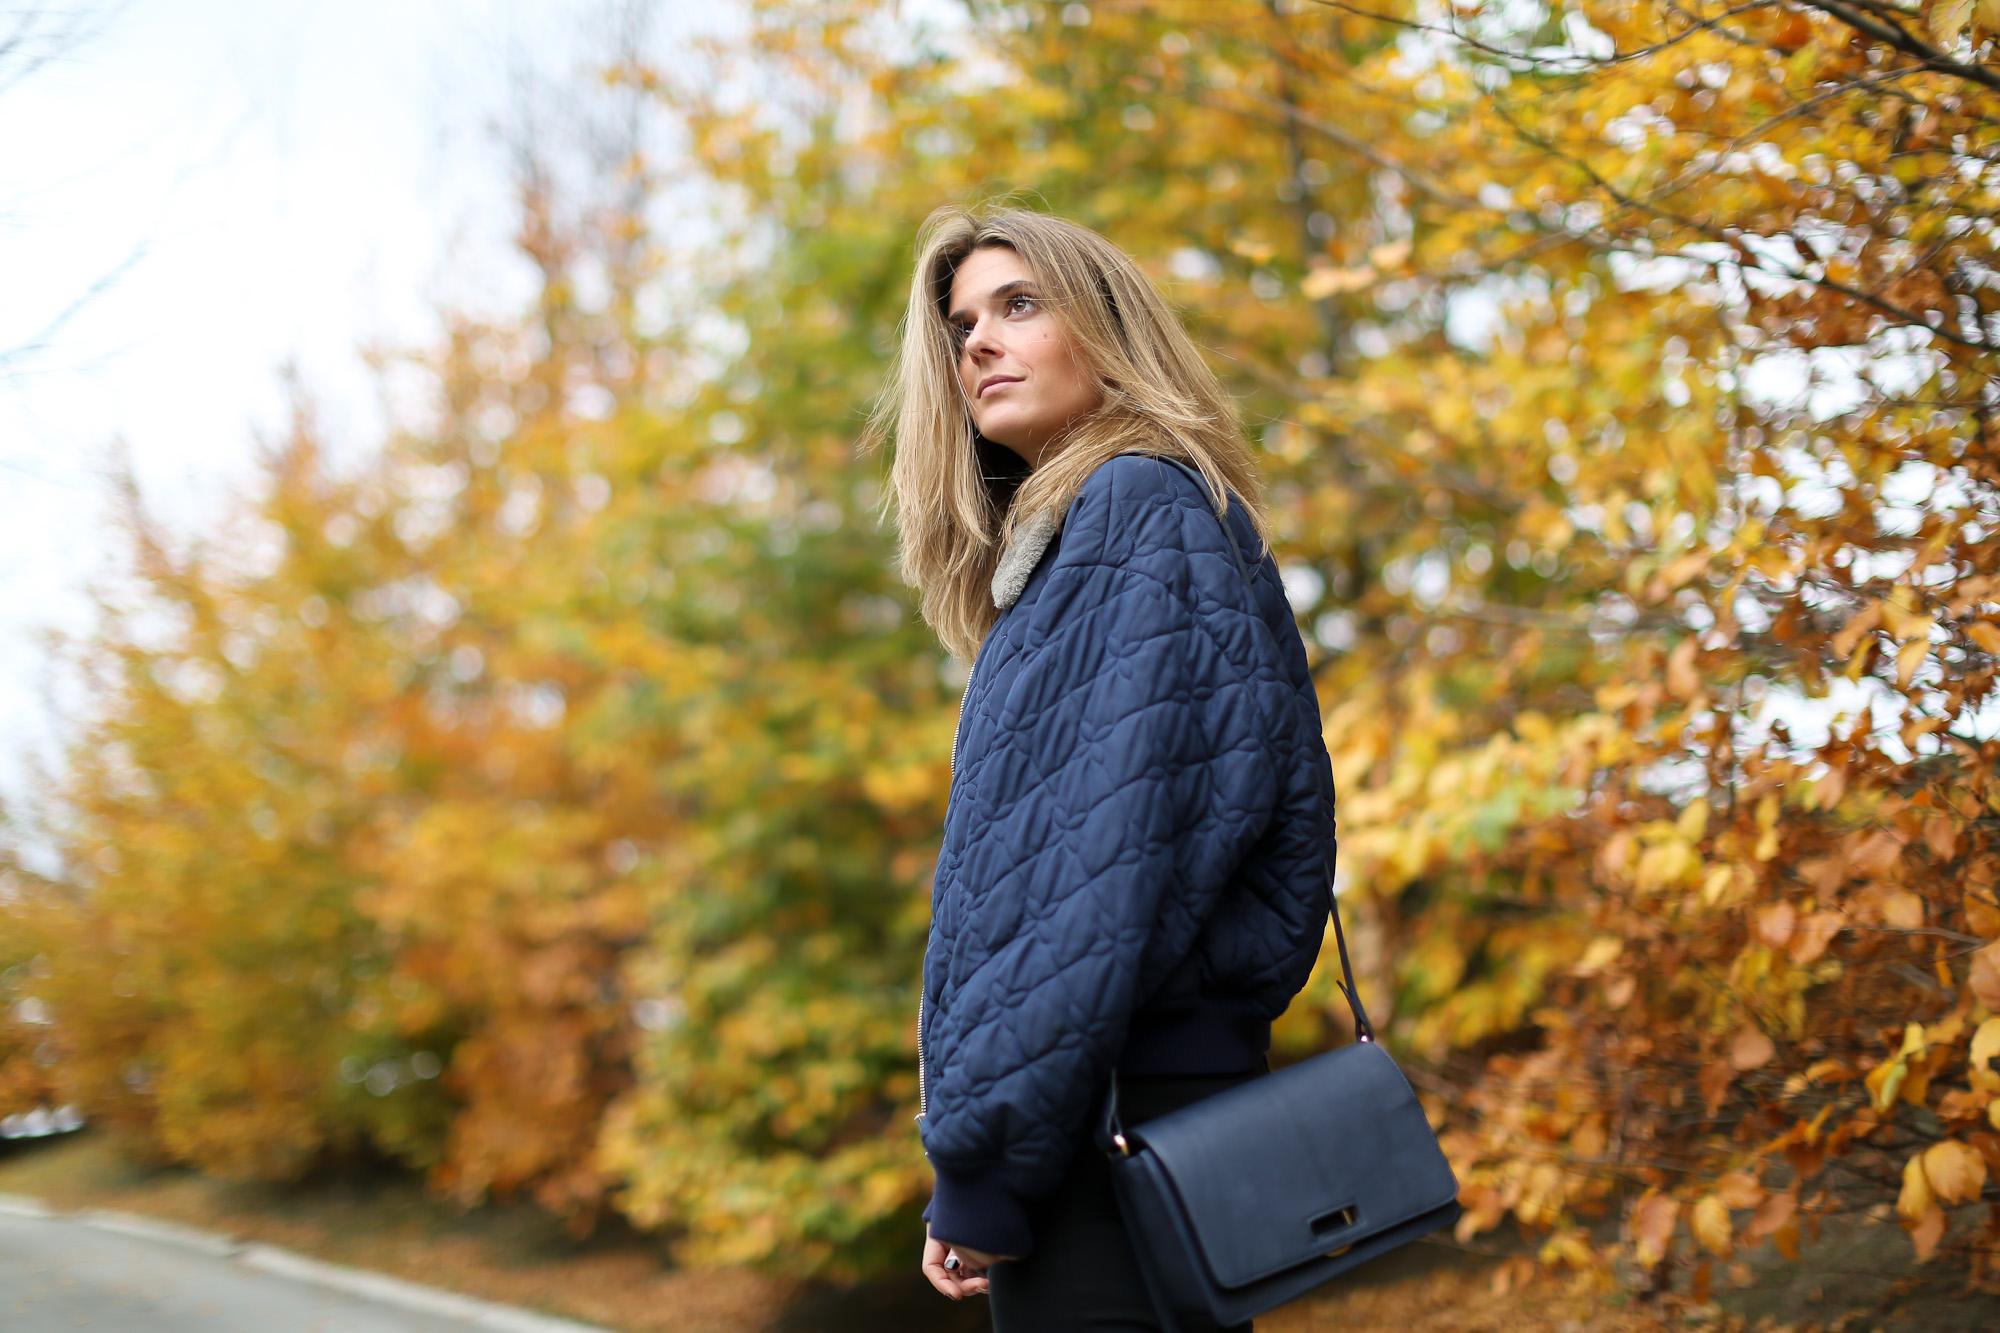 Clochet_streetstyle_stefanel_bomber_jacket_mango_suede_pumps-9